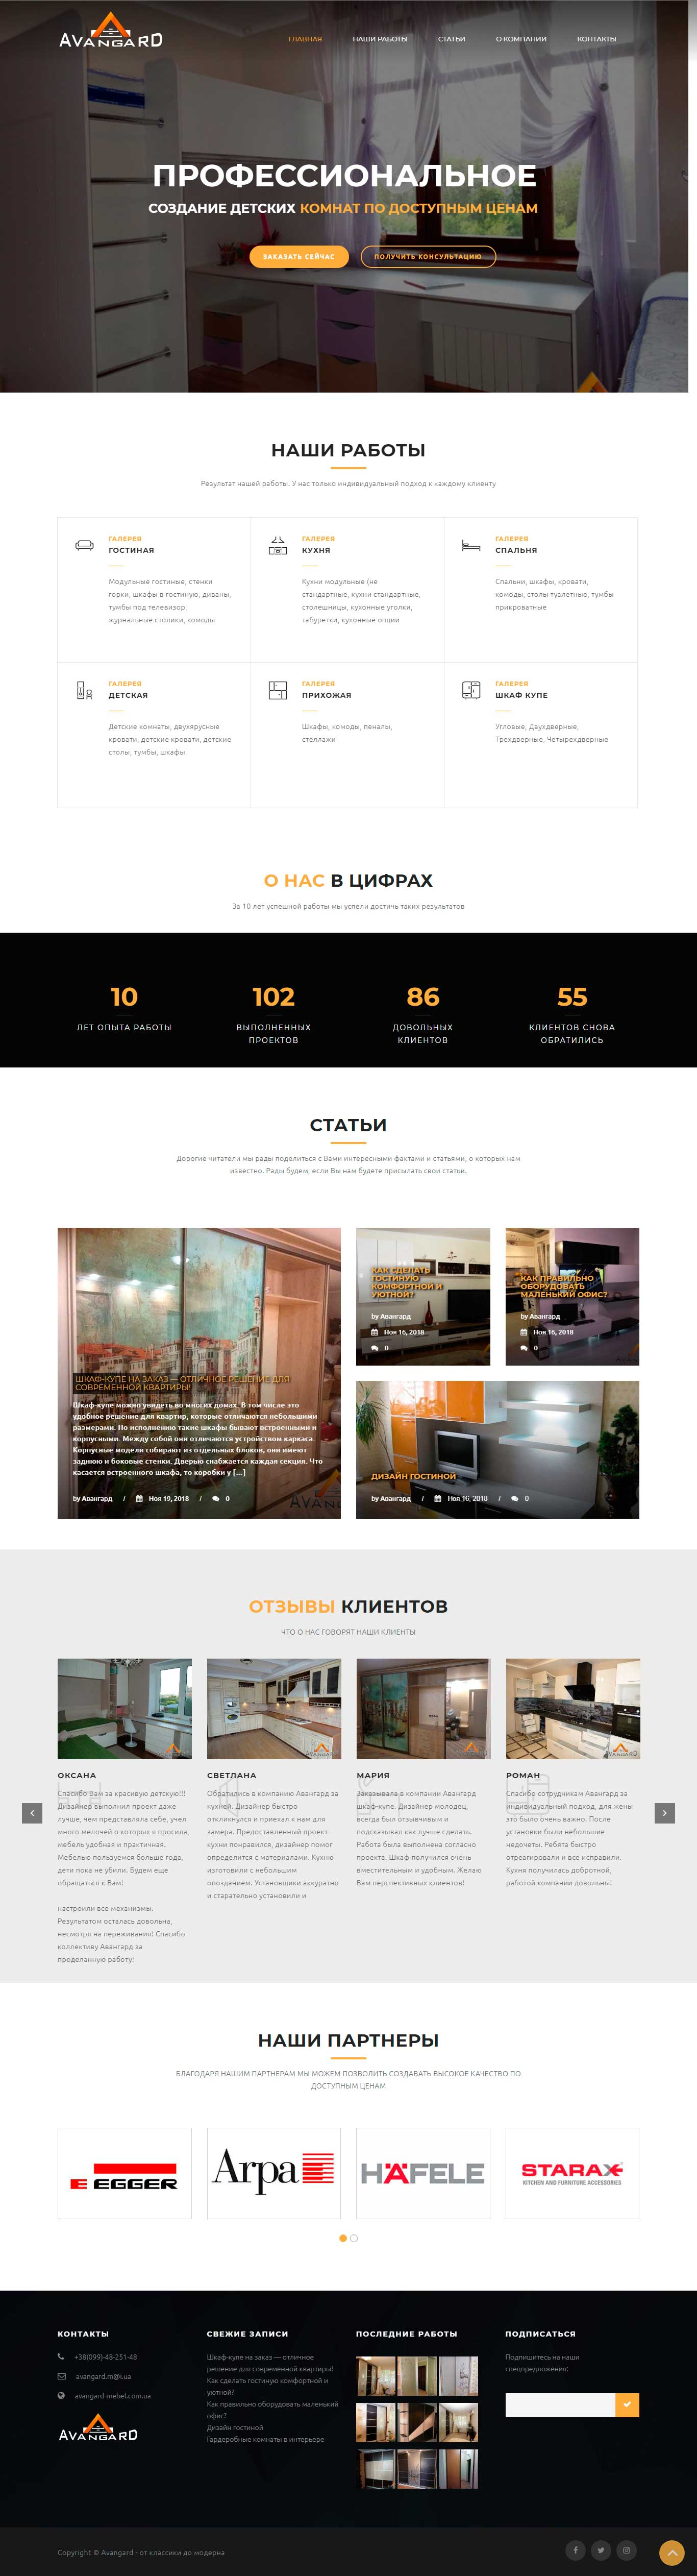 Avangard-изготовление мебели на заказ